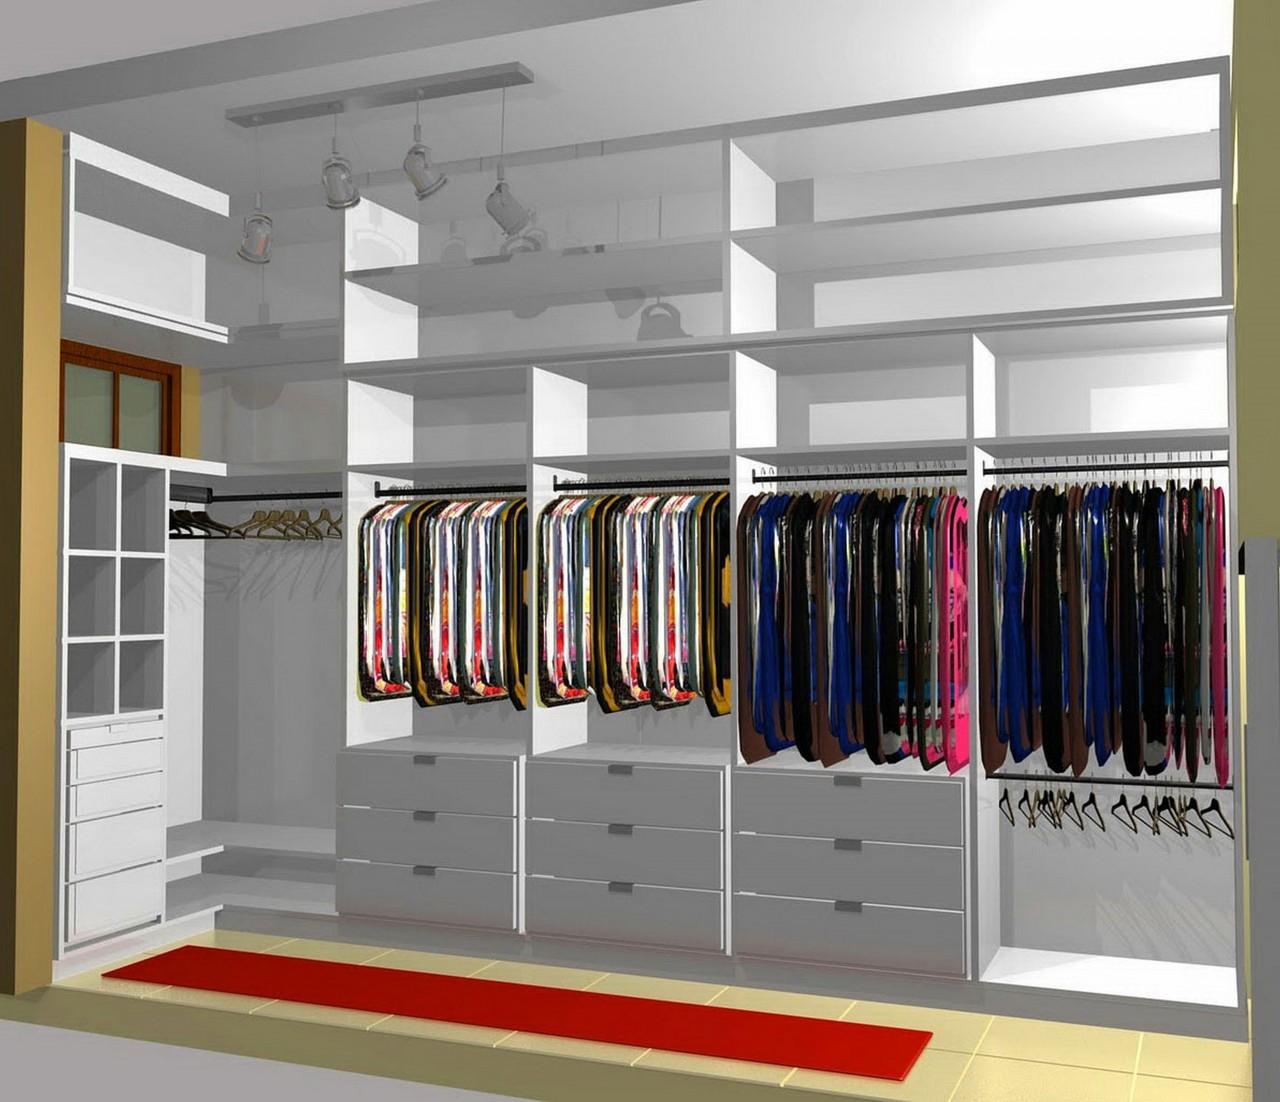 walk-in-closet-ideas-closet-design-ideas-home-interior-design-urumi-Exquisite-Nice-Decor-Cool-Furniture-Licious-house-color-design-ideas-Craftsman-Style-1280x1102